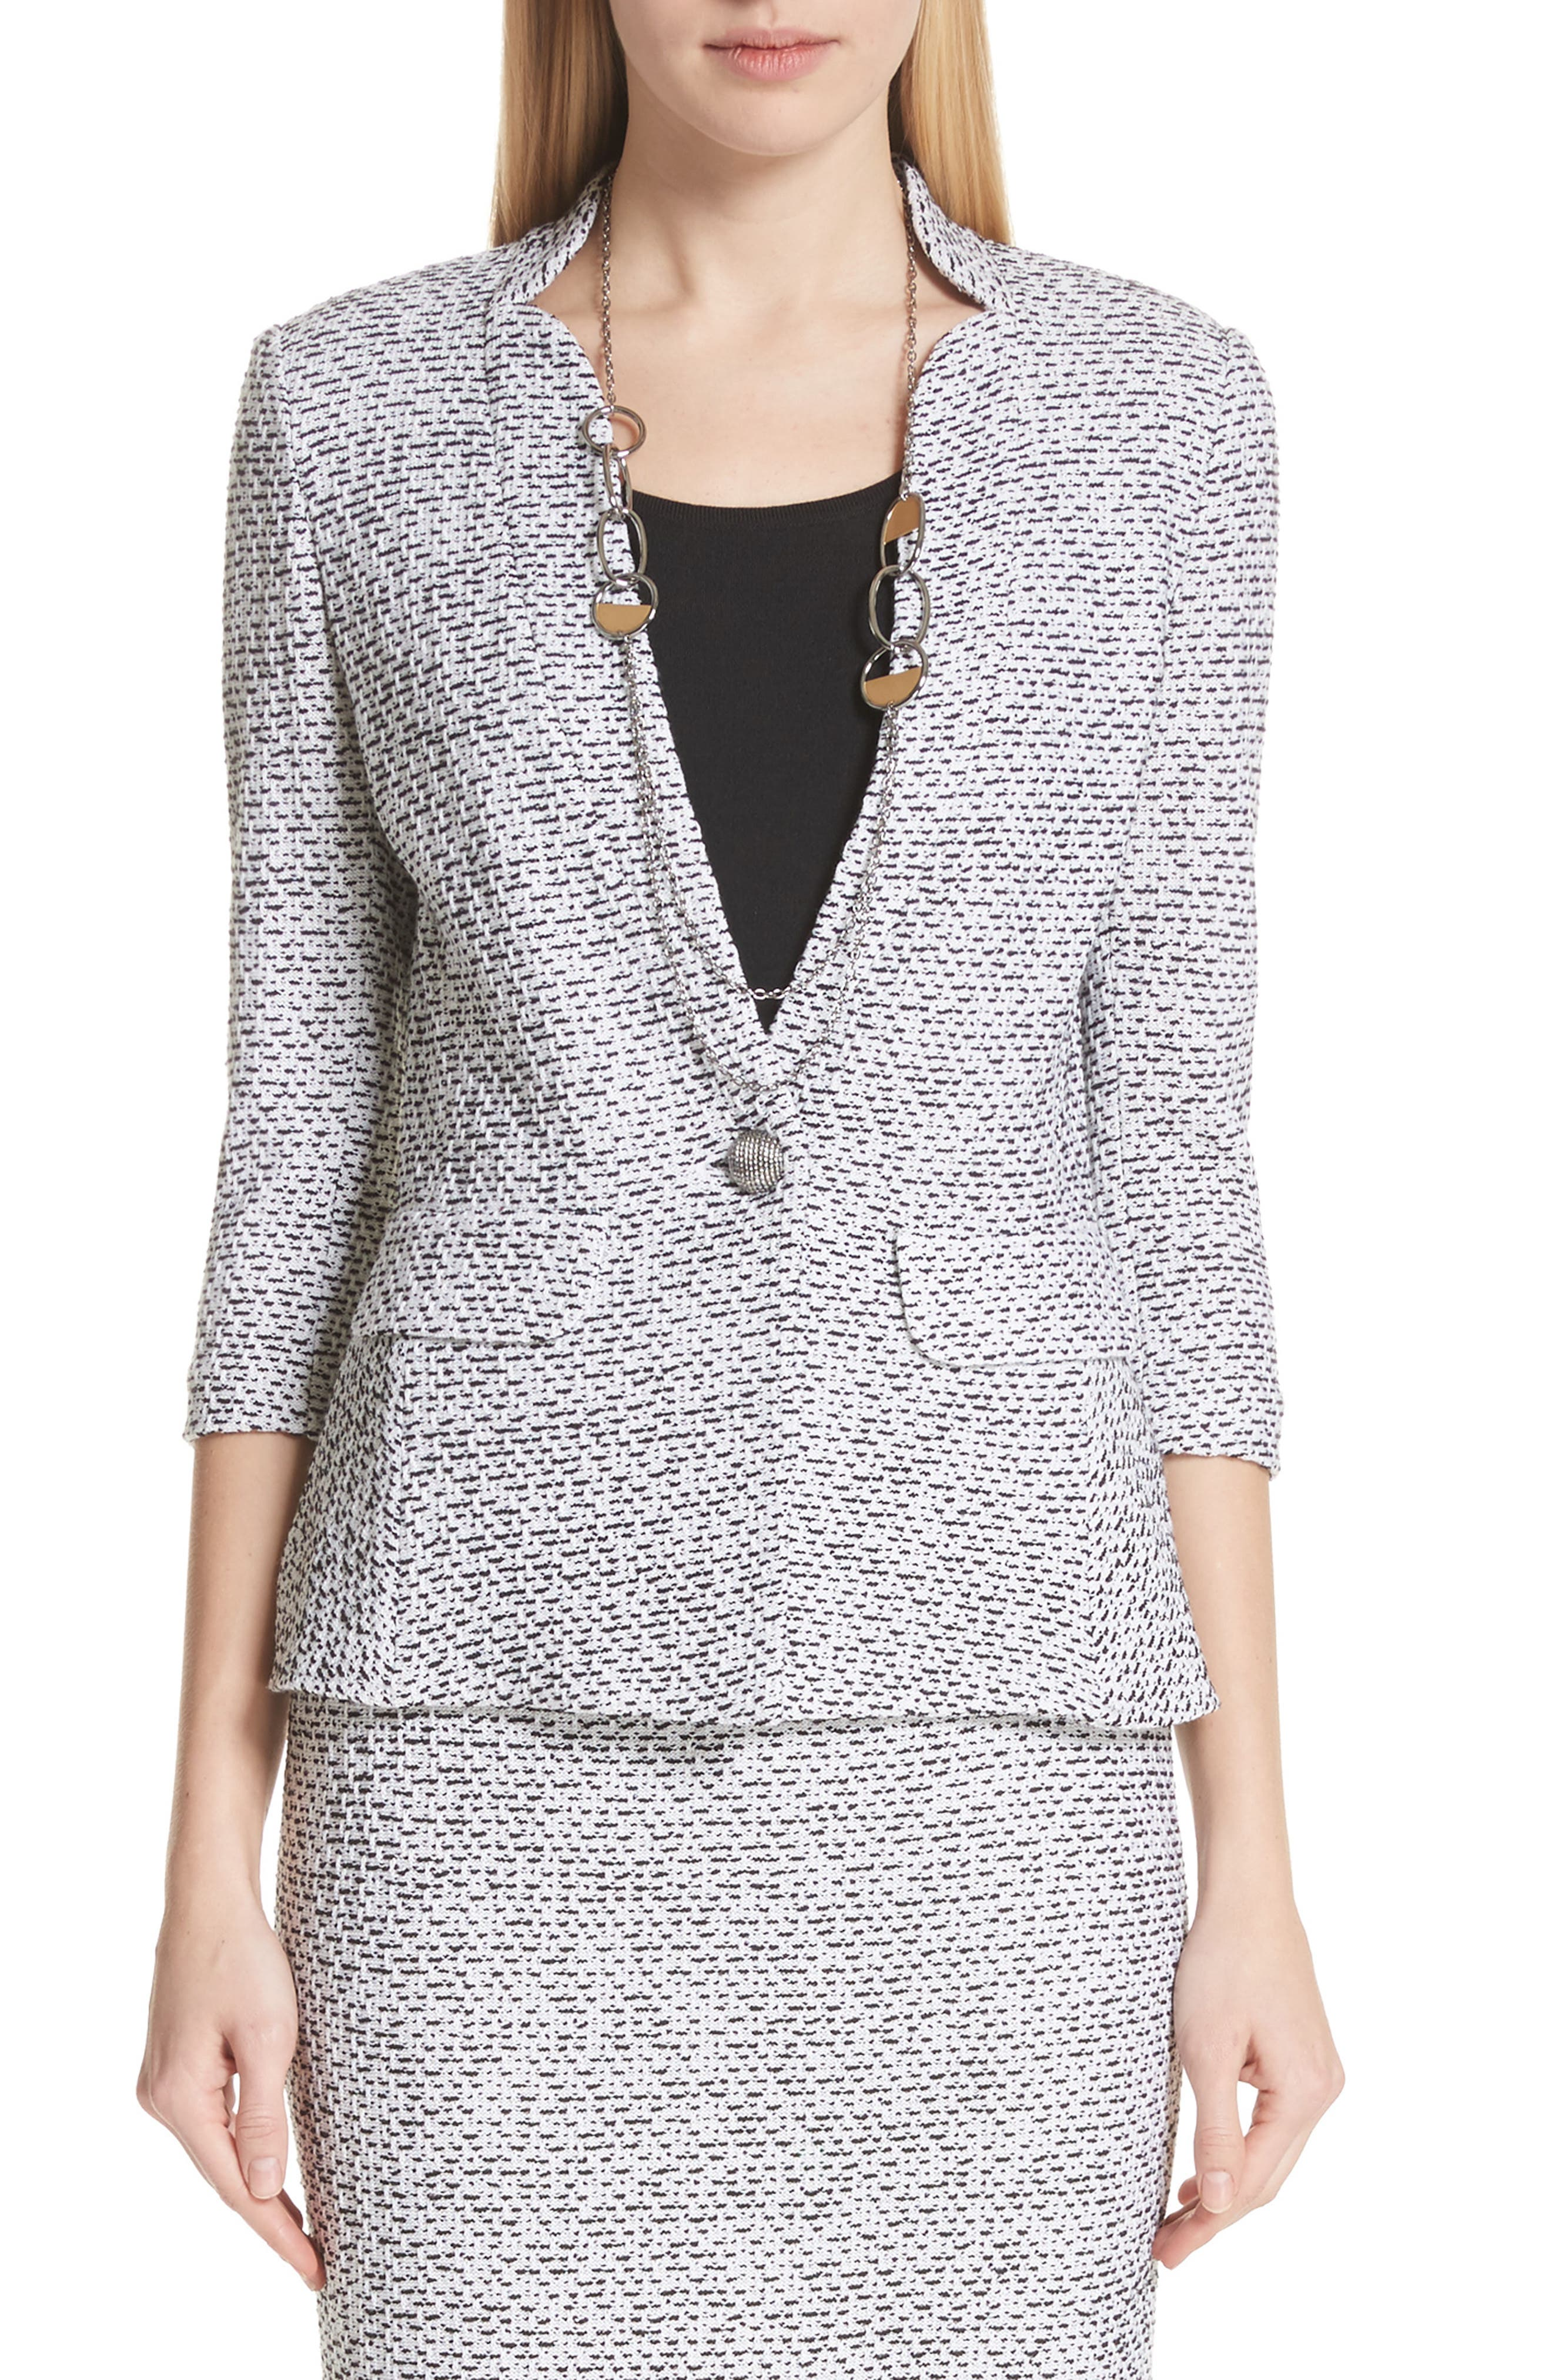 Olivia Bouclé Knit Jacket,                             Main thumbnail 1, color,                             WHITE/ CAVIAR